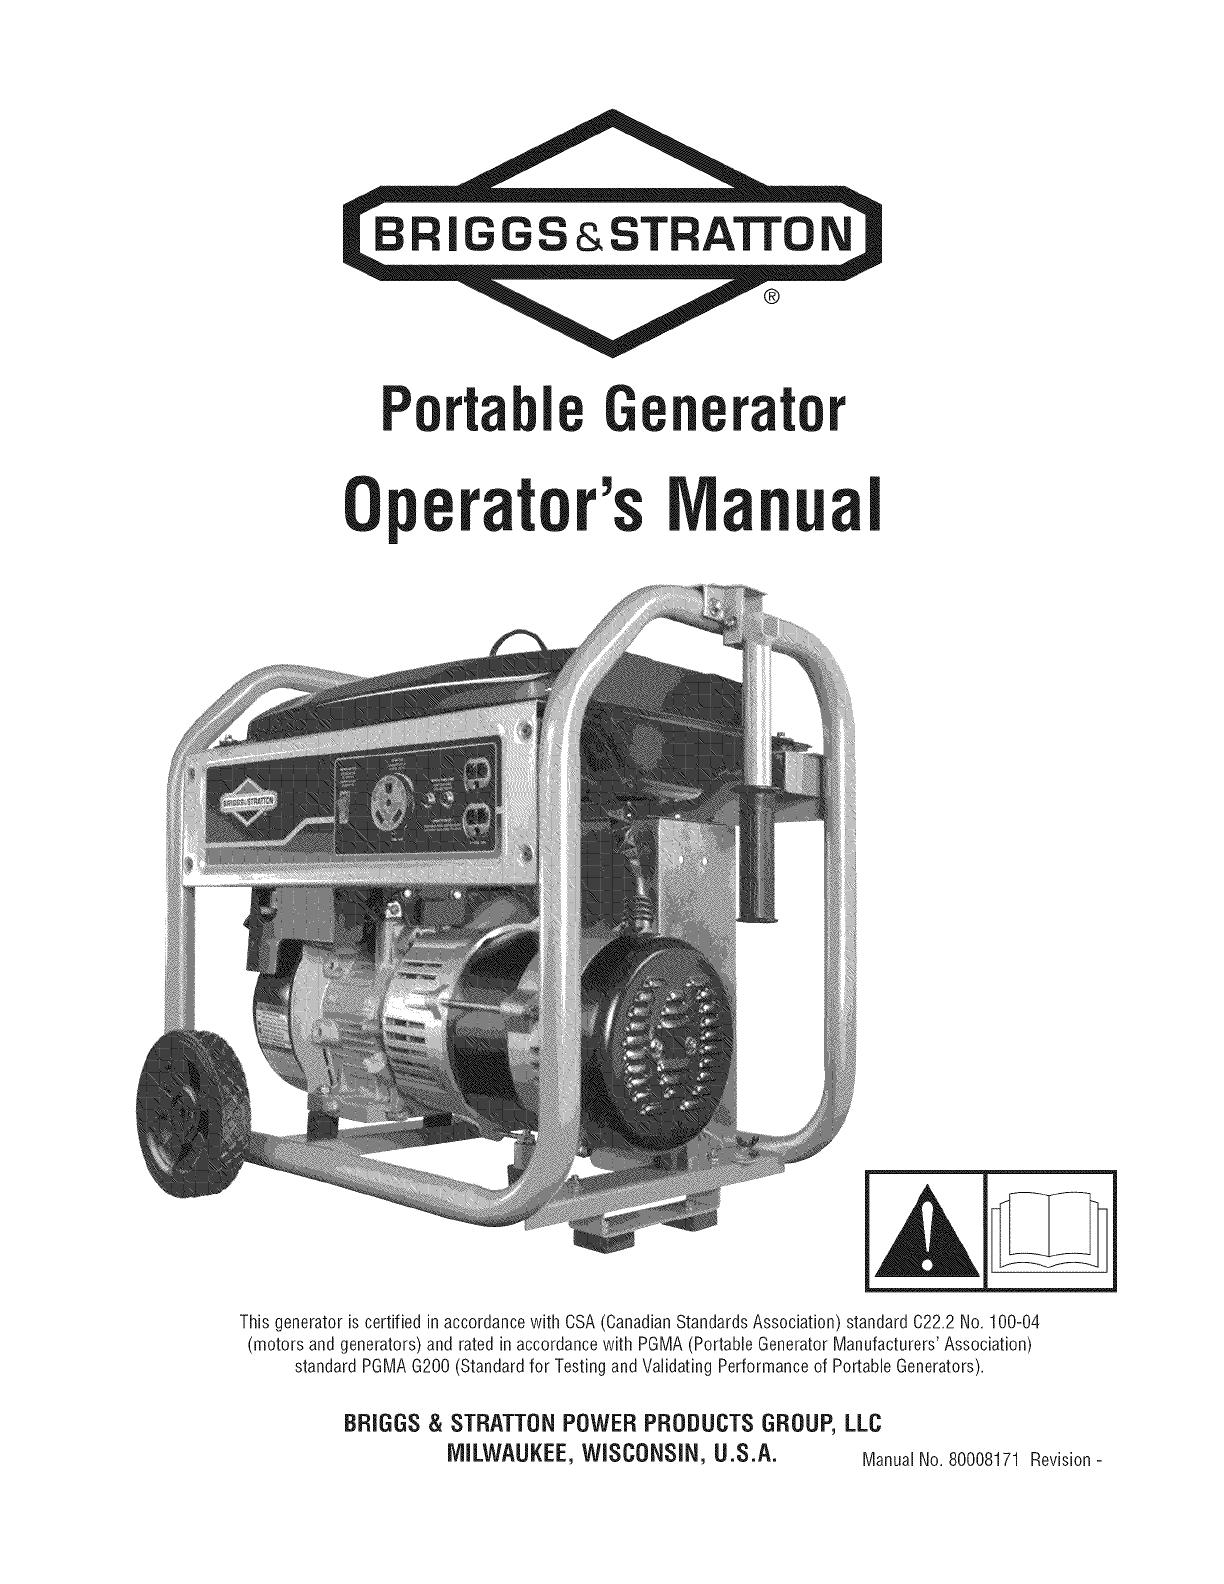 Briggs & Stratton 030547 00 User Manual GENERATOR Manuals